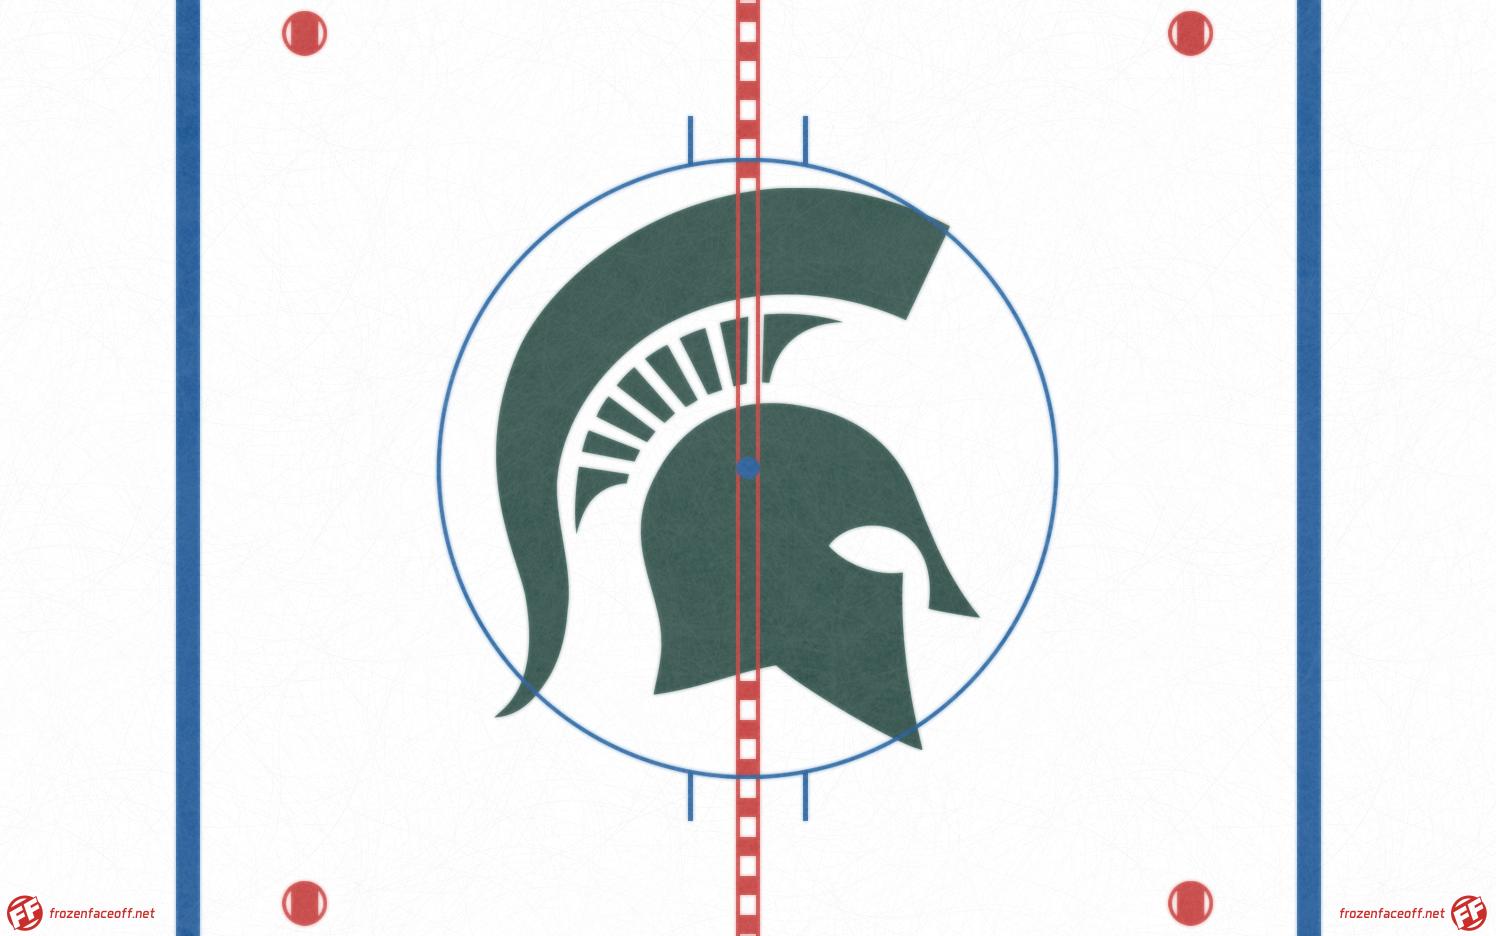 Michigan State Spartans 2015-2012